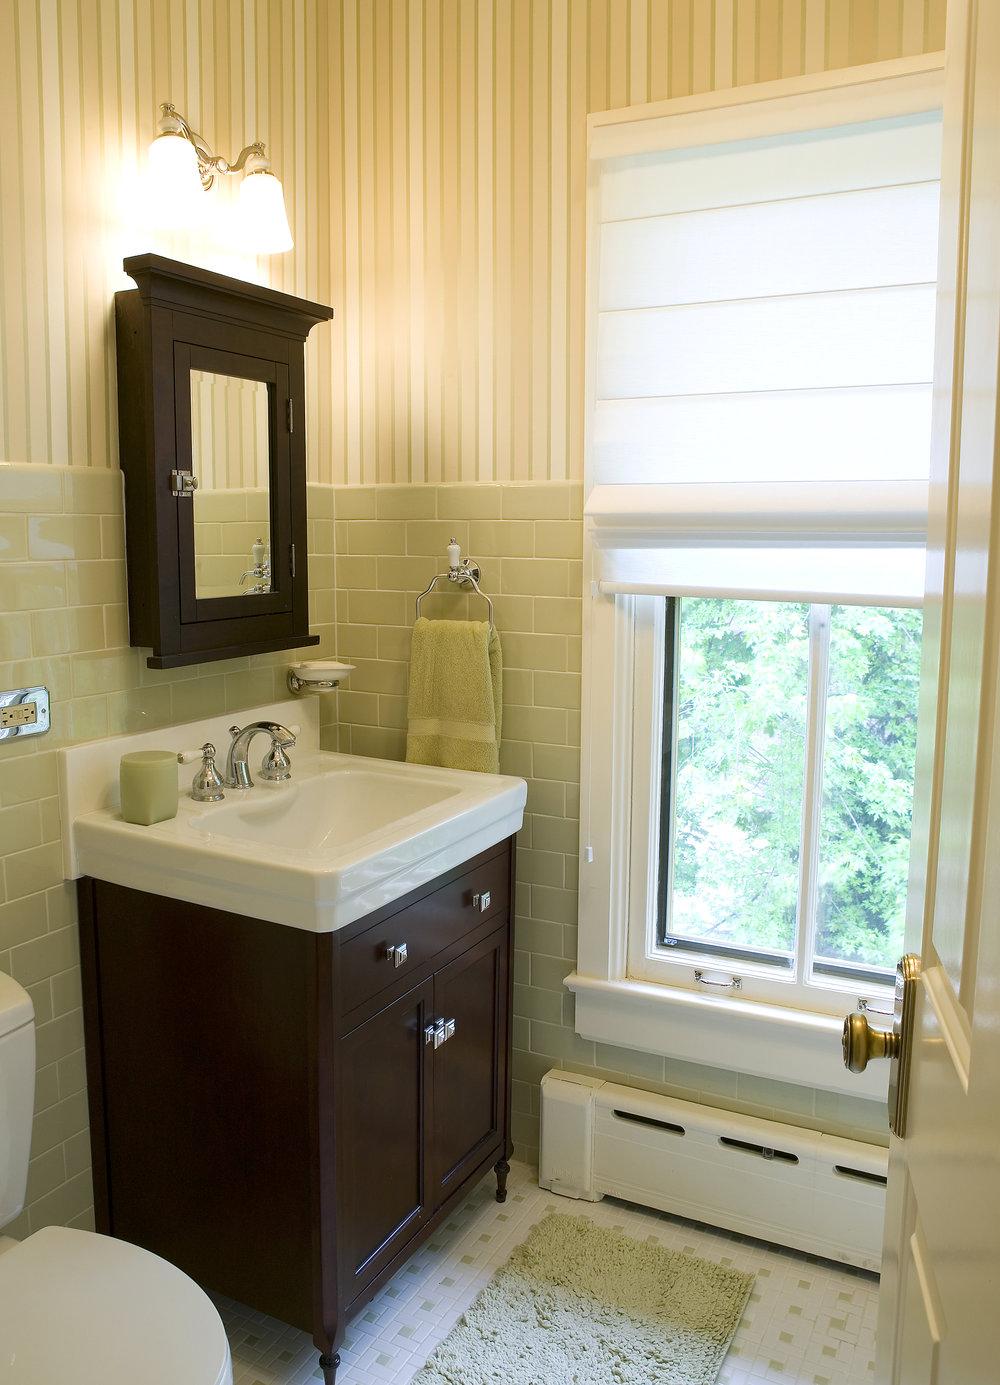 Bathroom interior design 1210 GREENWOOD 007.jpg